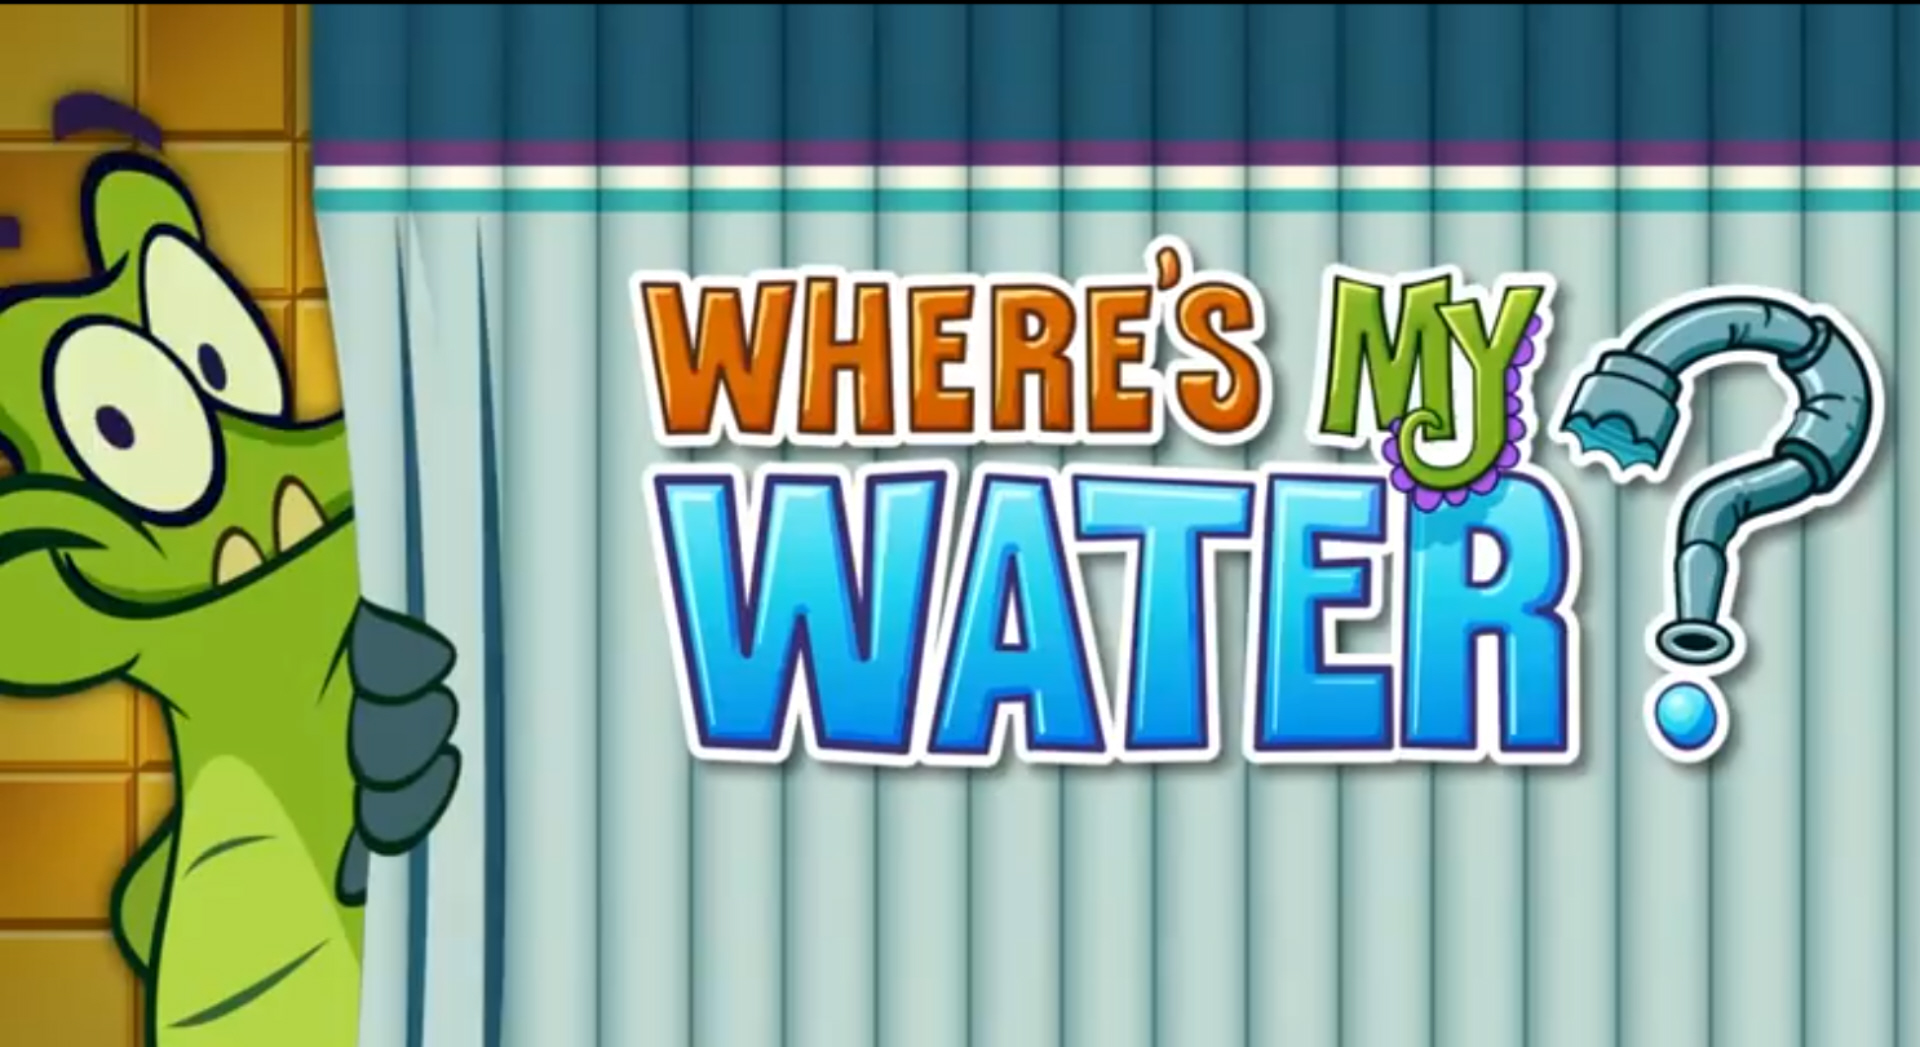 Where's My Water? Wallpaper iPhone Disney GameCenter Achievements Artwork